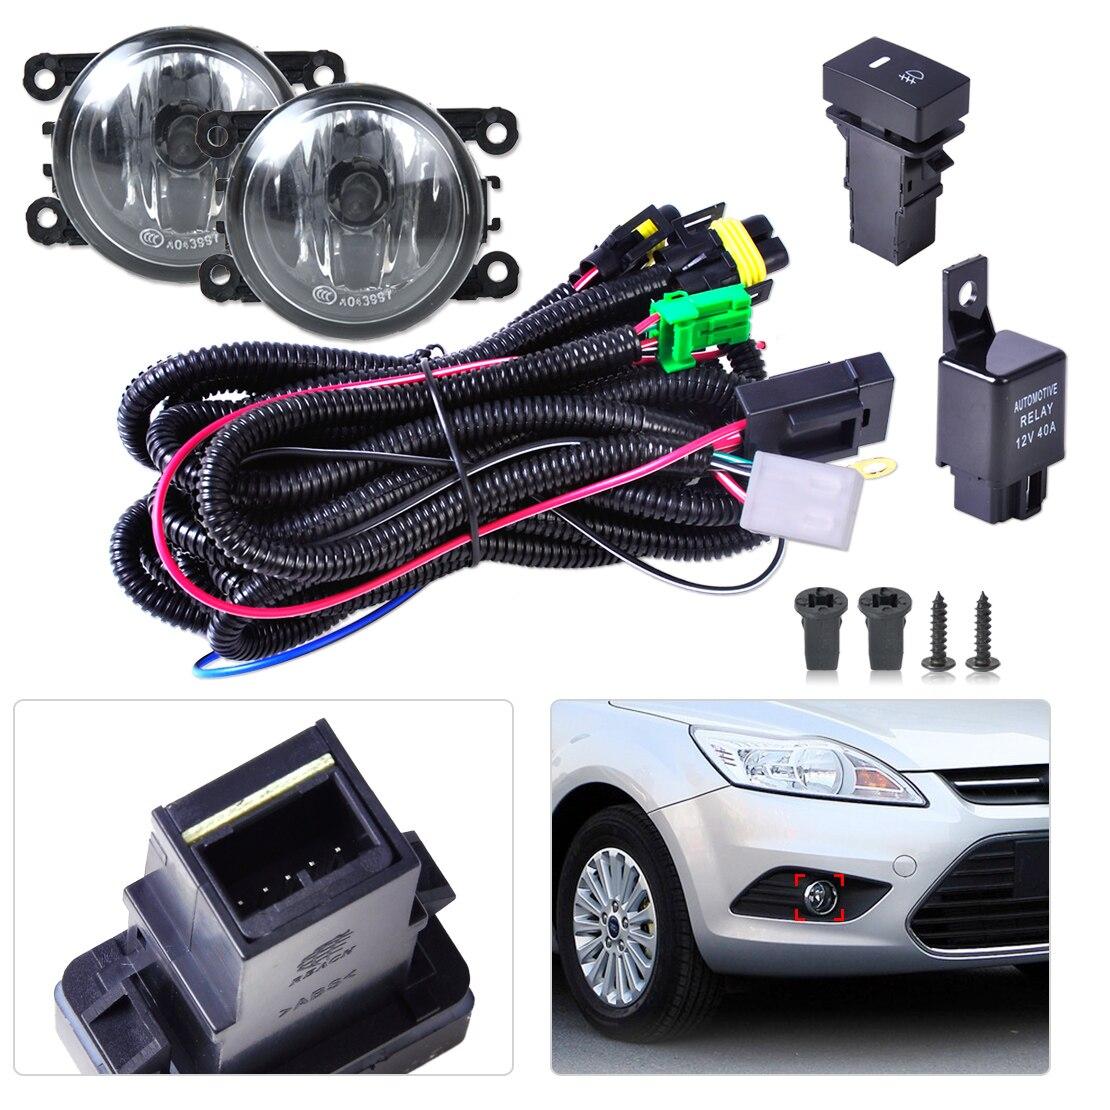 Dwcx black wiring harness sockets switch 2 fog lights h11 lamp 12v 55w kit for ford mustang lincoln navigator subaru outback